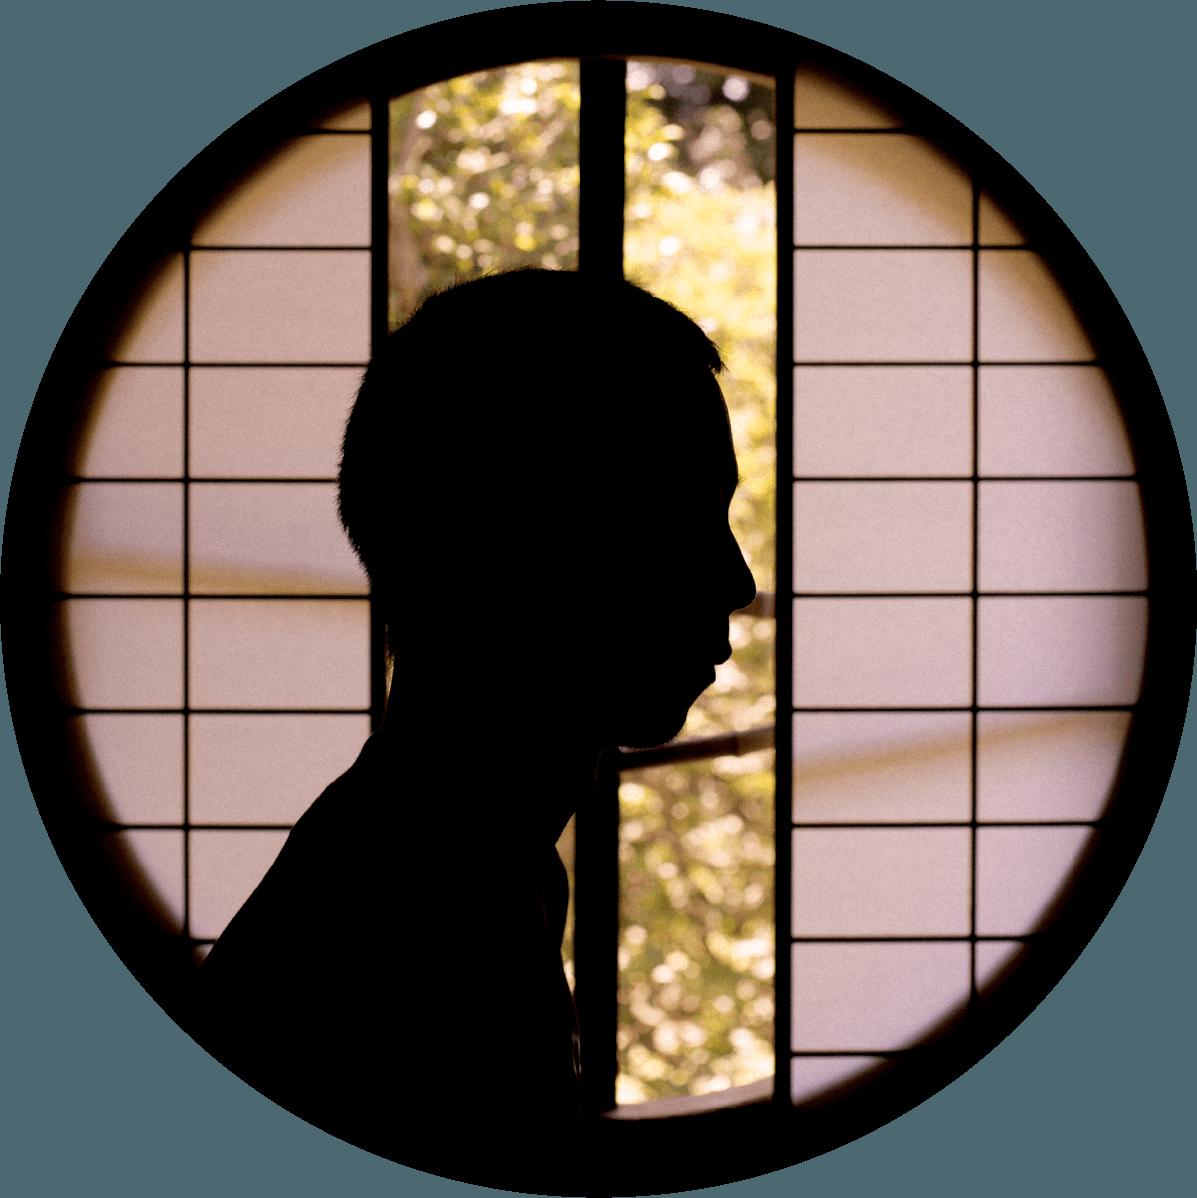 shadow profile portrait of hanzawa in a circle